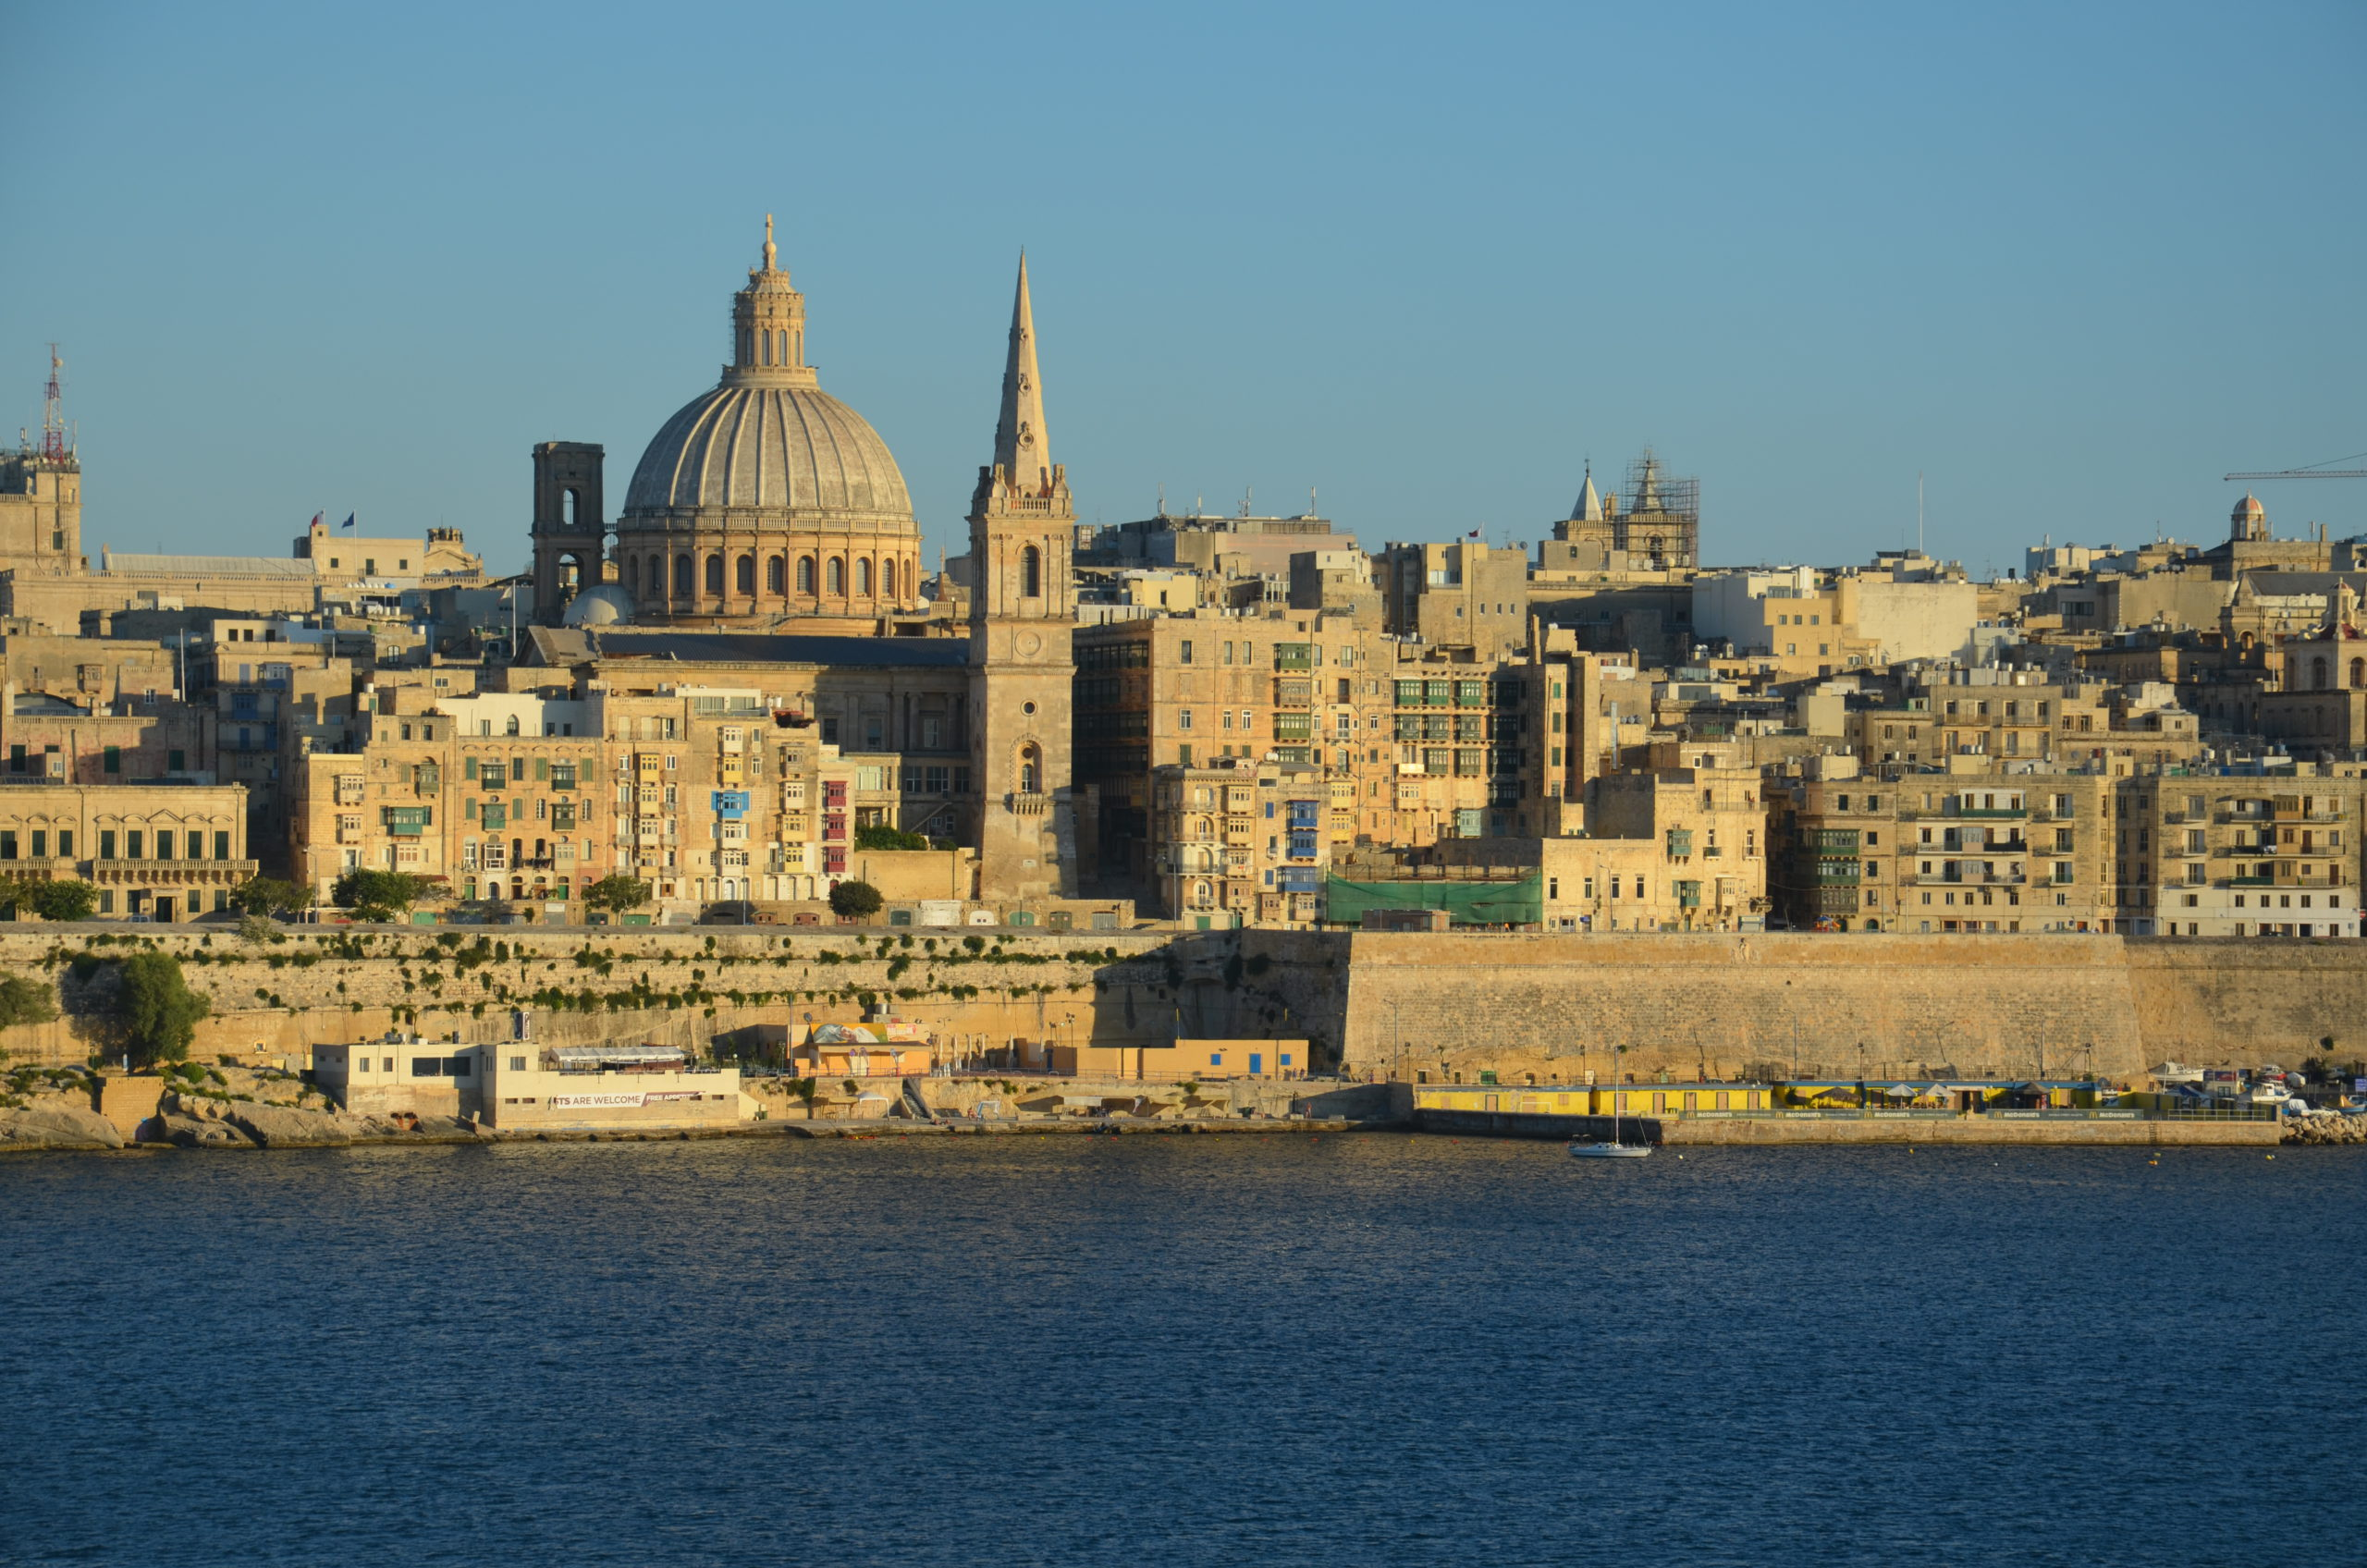 Valletta gezien vanuit Sliema.